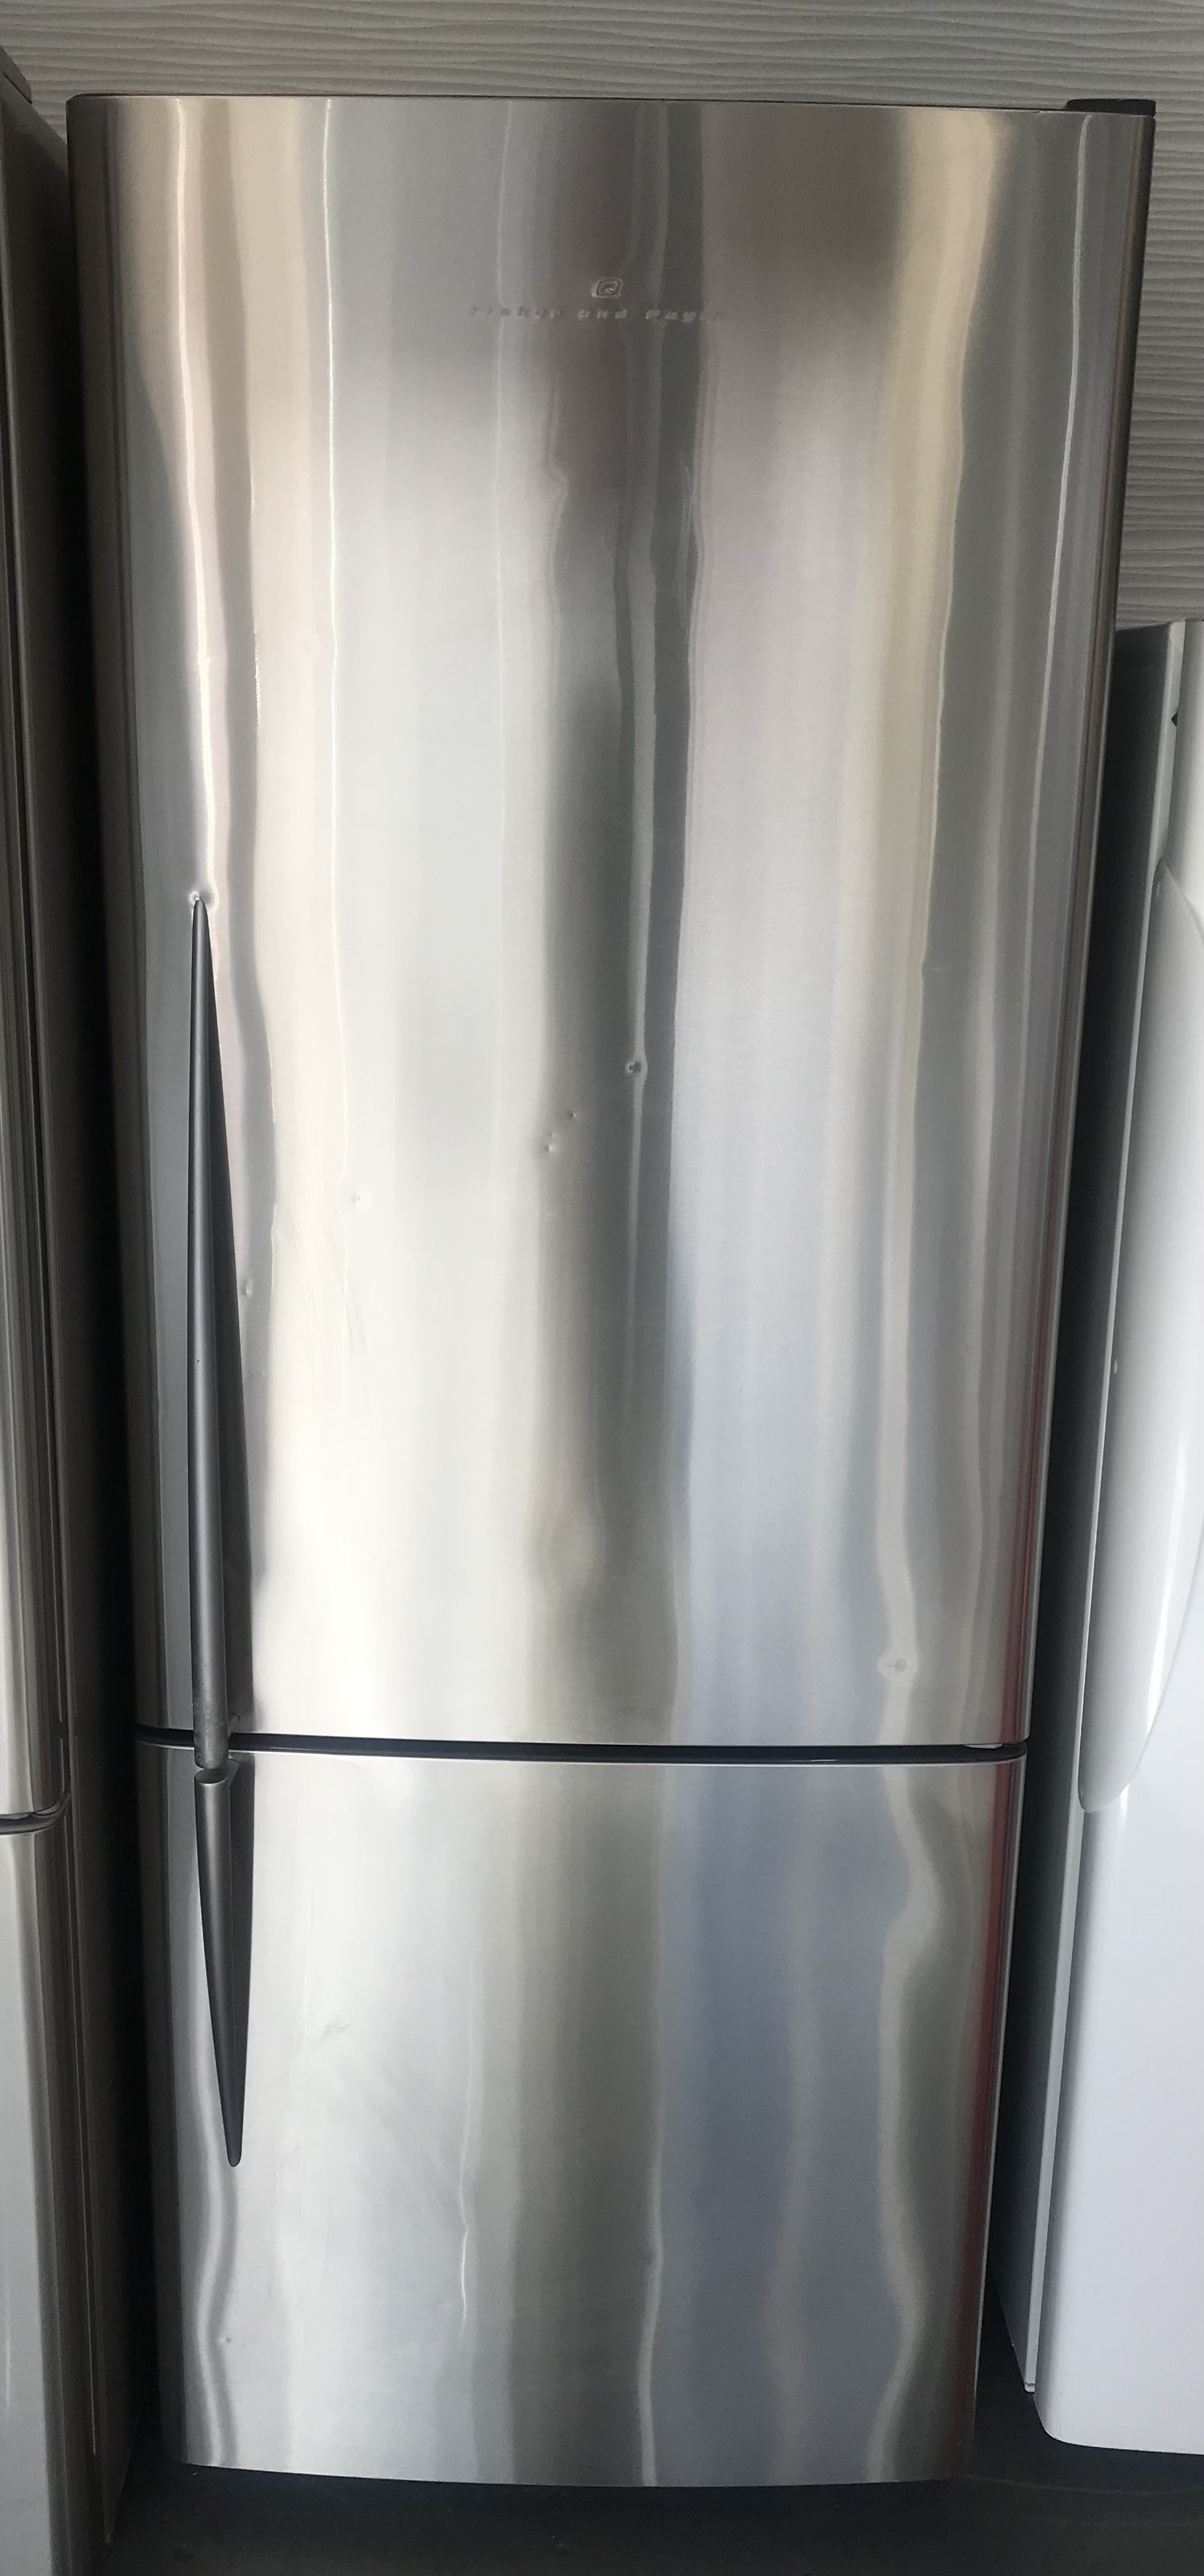 F&P Stainless Fridge/Freezer